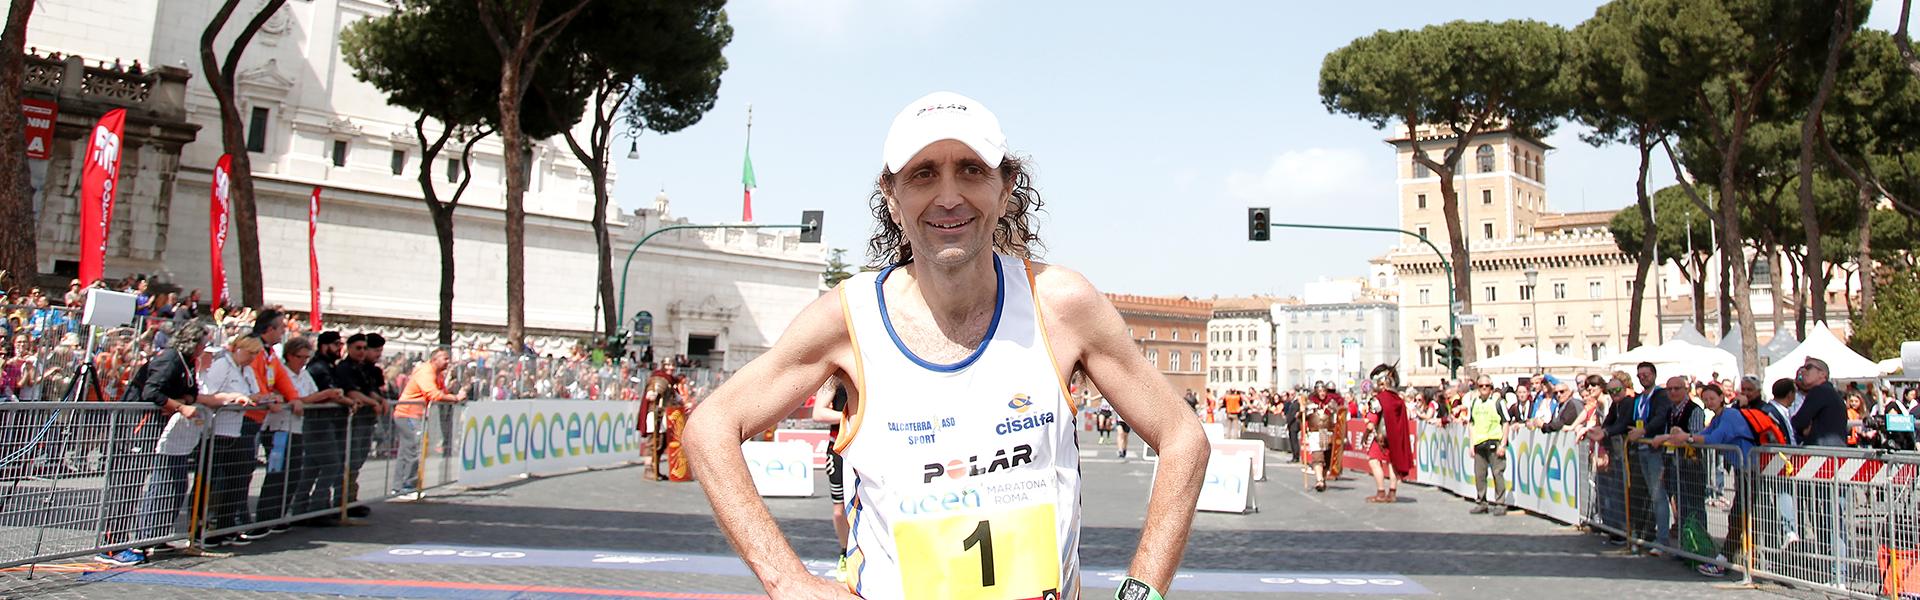 Giorgio Calcaterra explains the Acea Run Rome the Marathon route